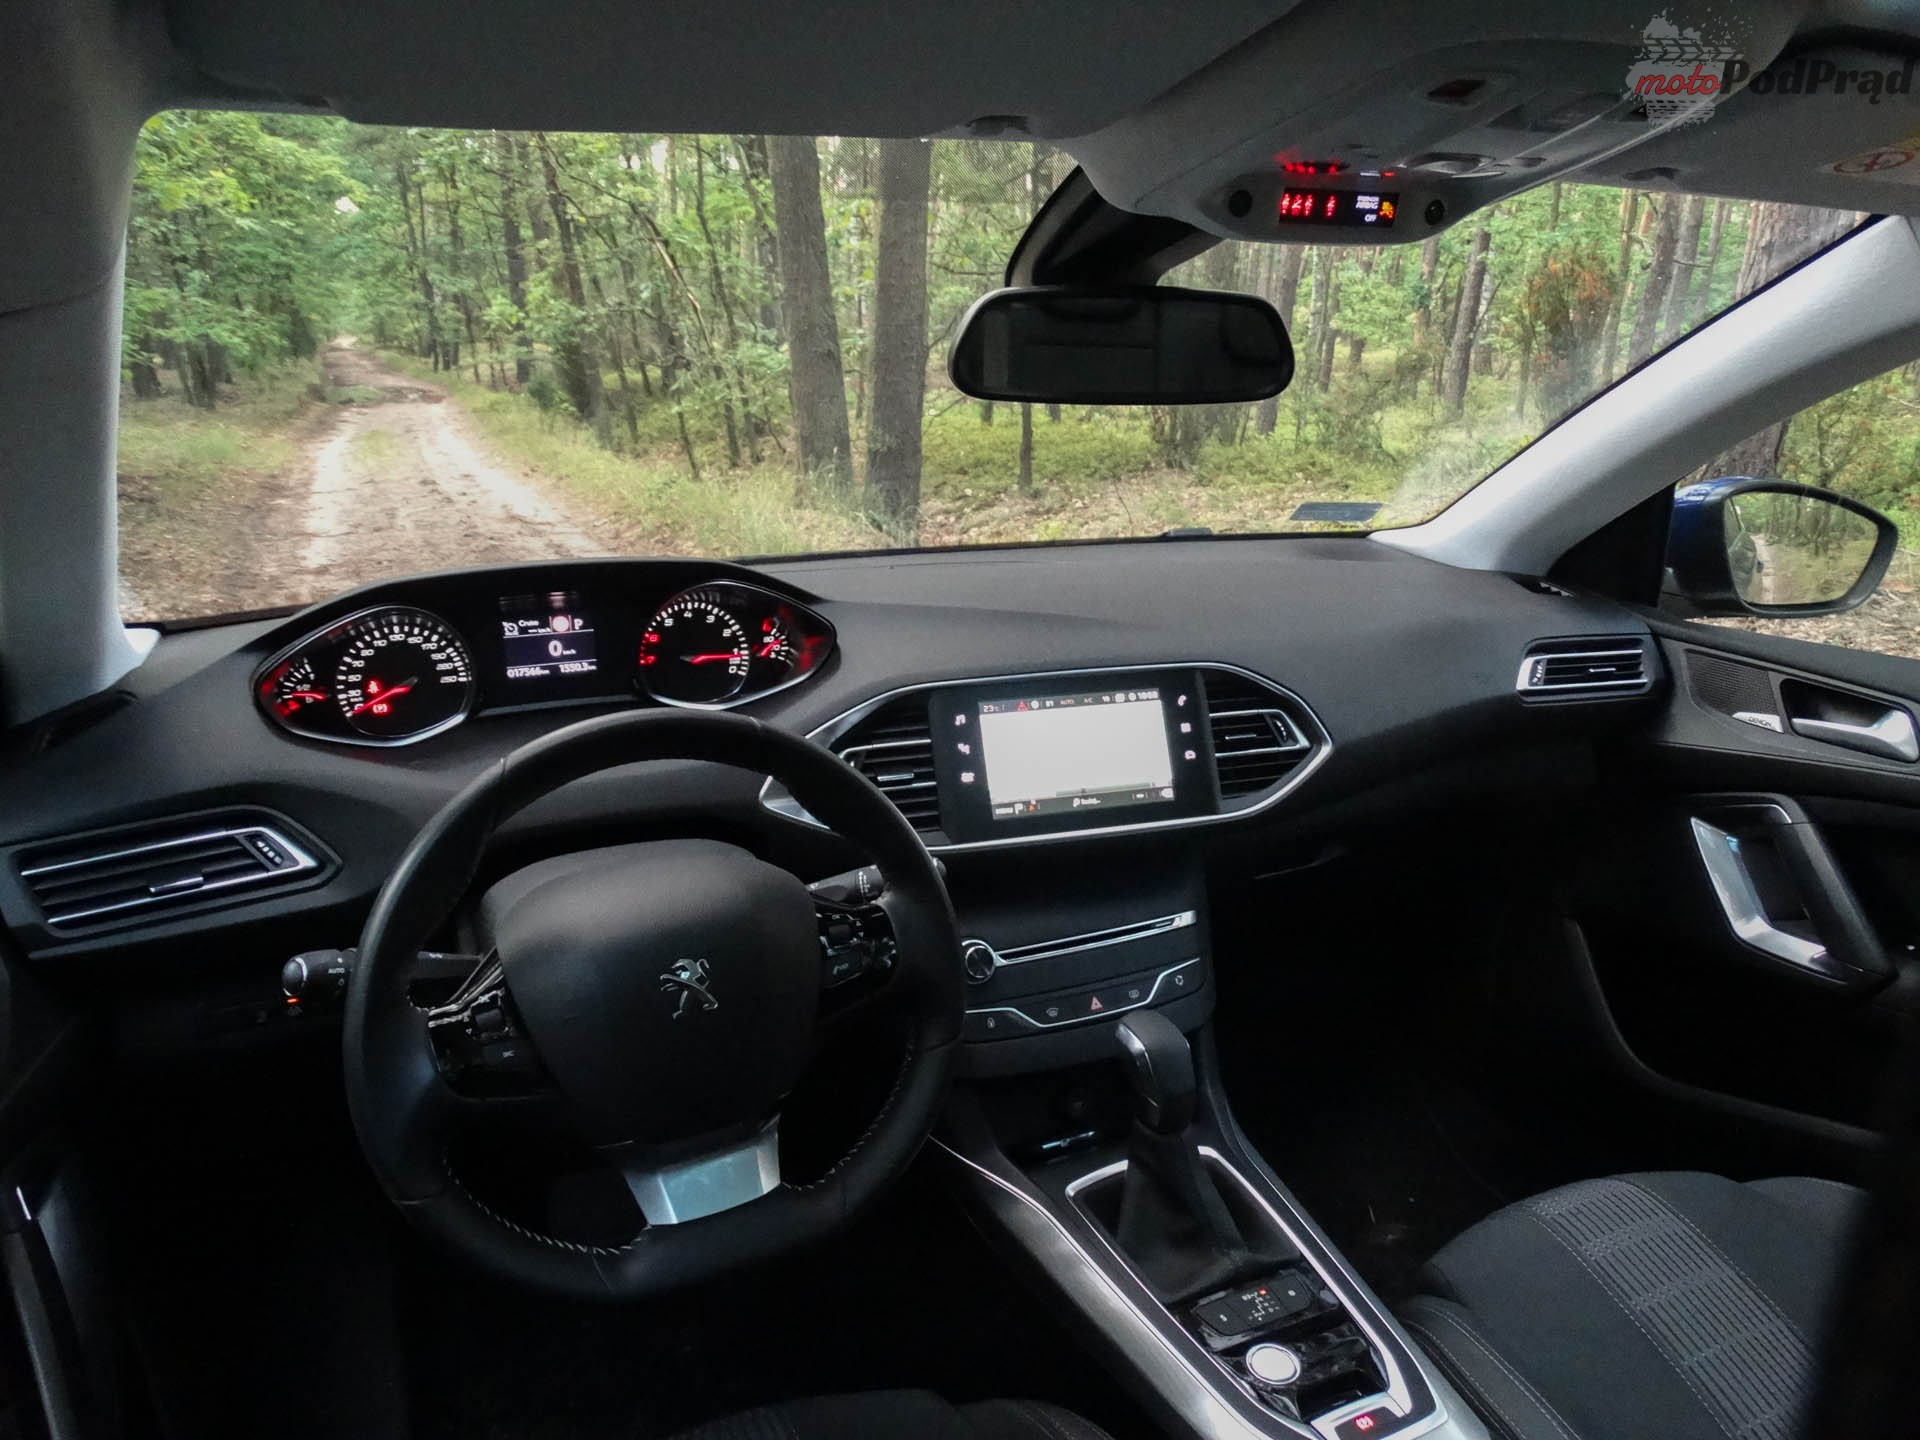 Peugeot 308 SW 9 Test: Peugeot 308 SW   prawie idealny